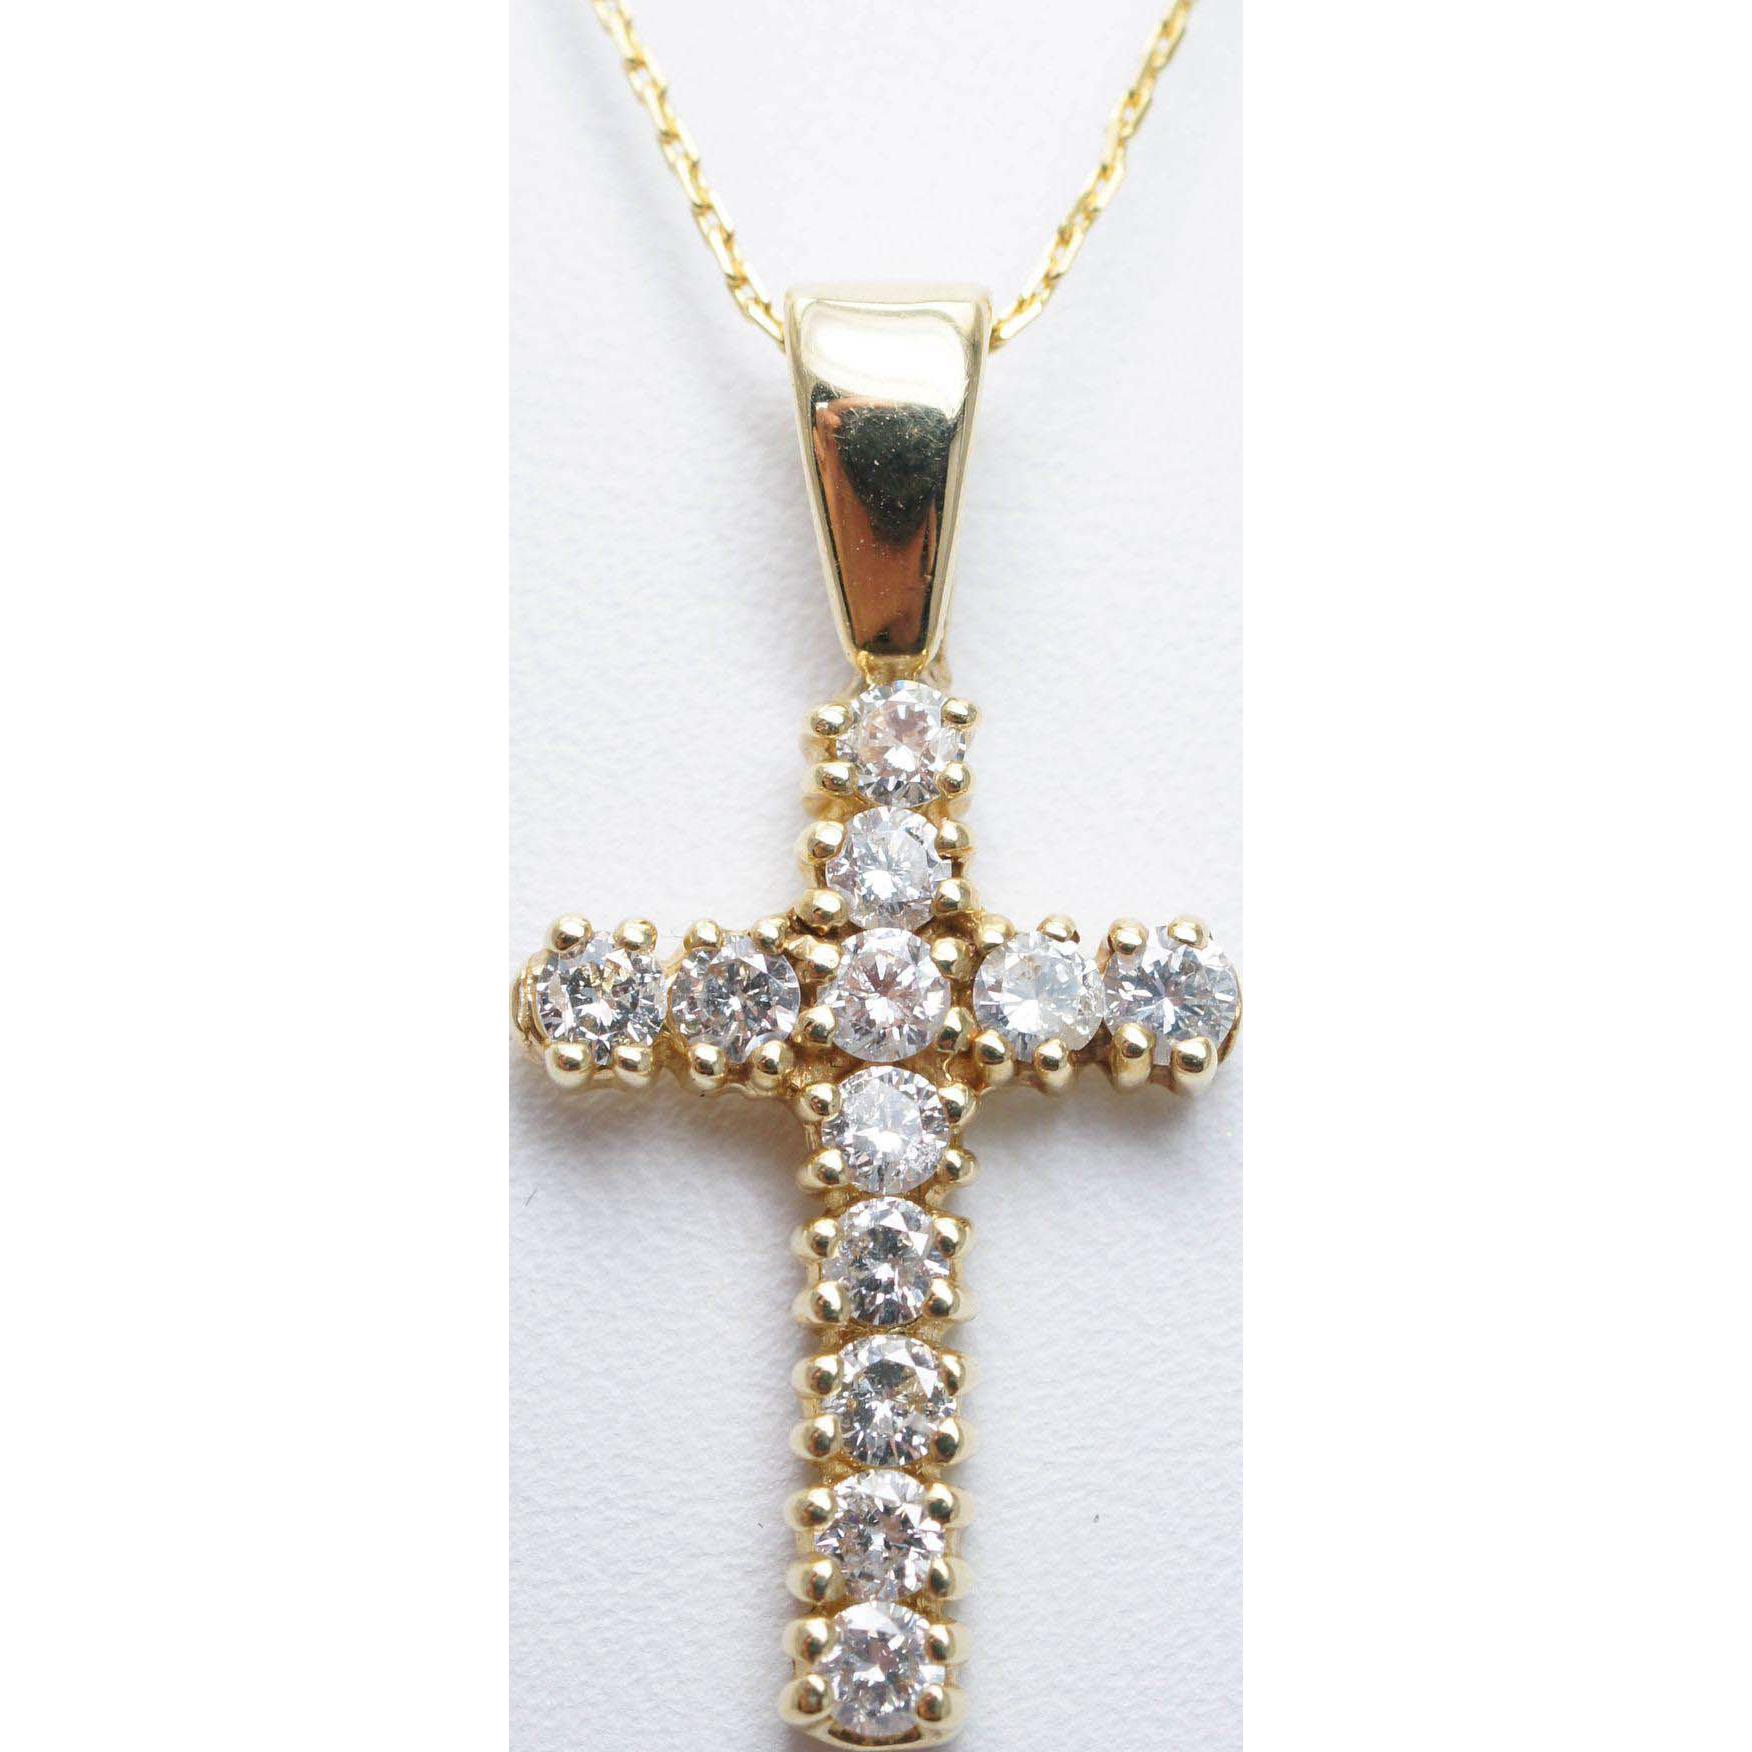 .96CTW Diamond Cross Pendant Necklace in 14k Yellow Gold